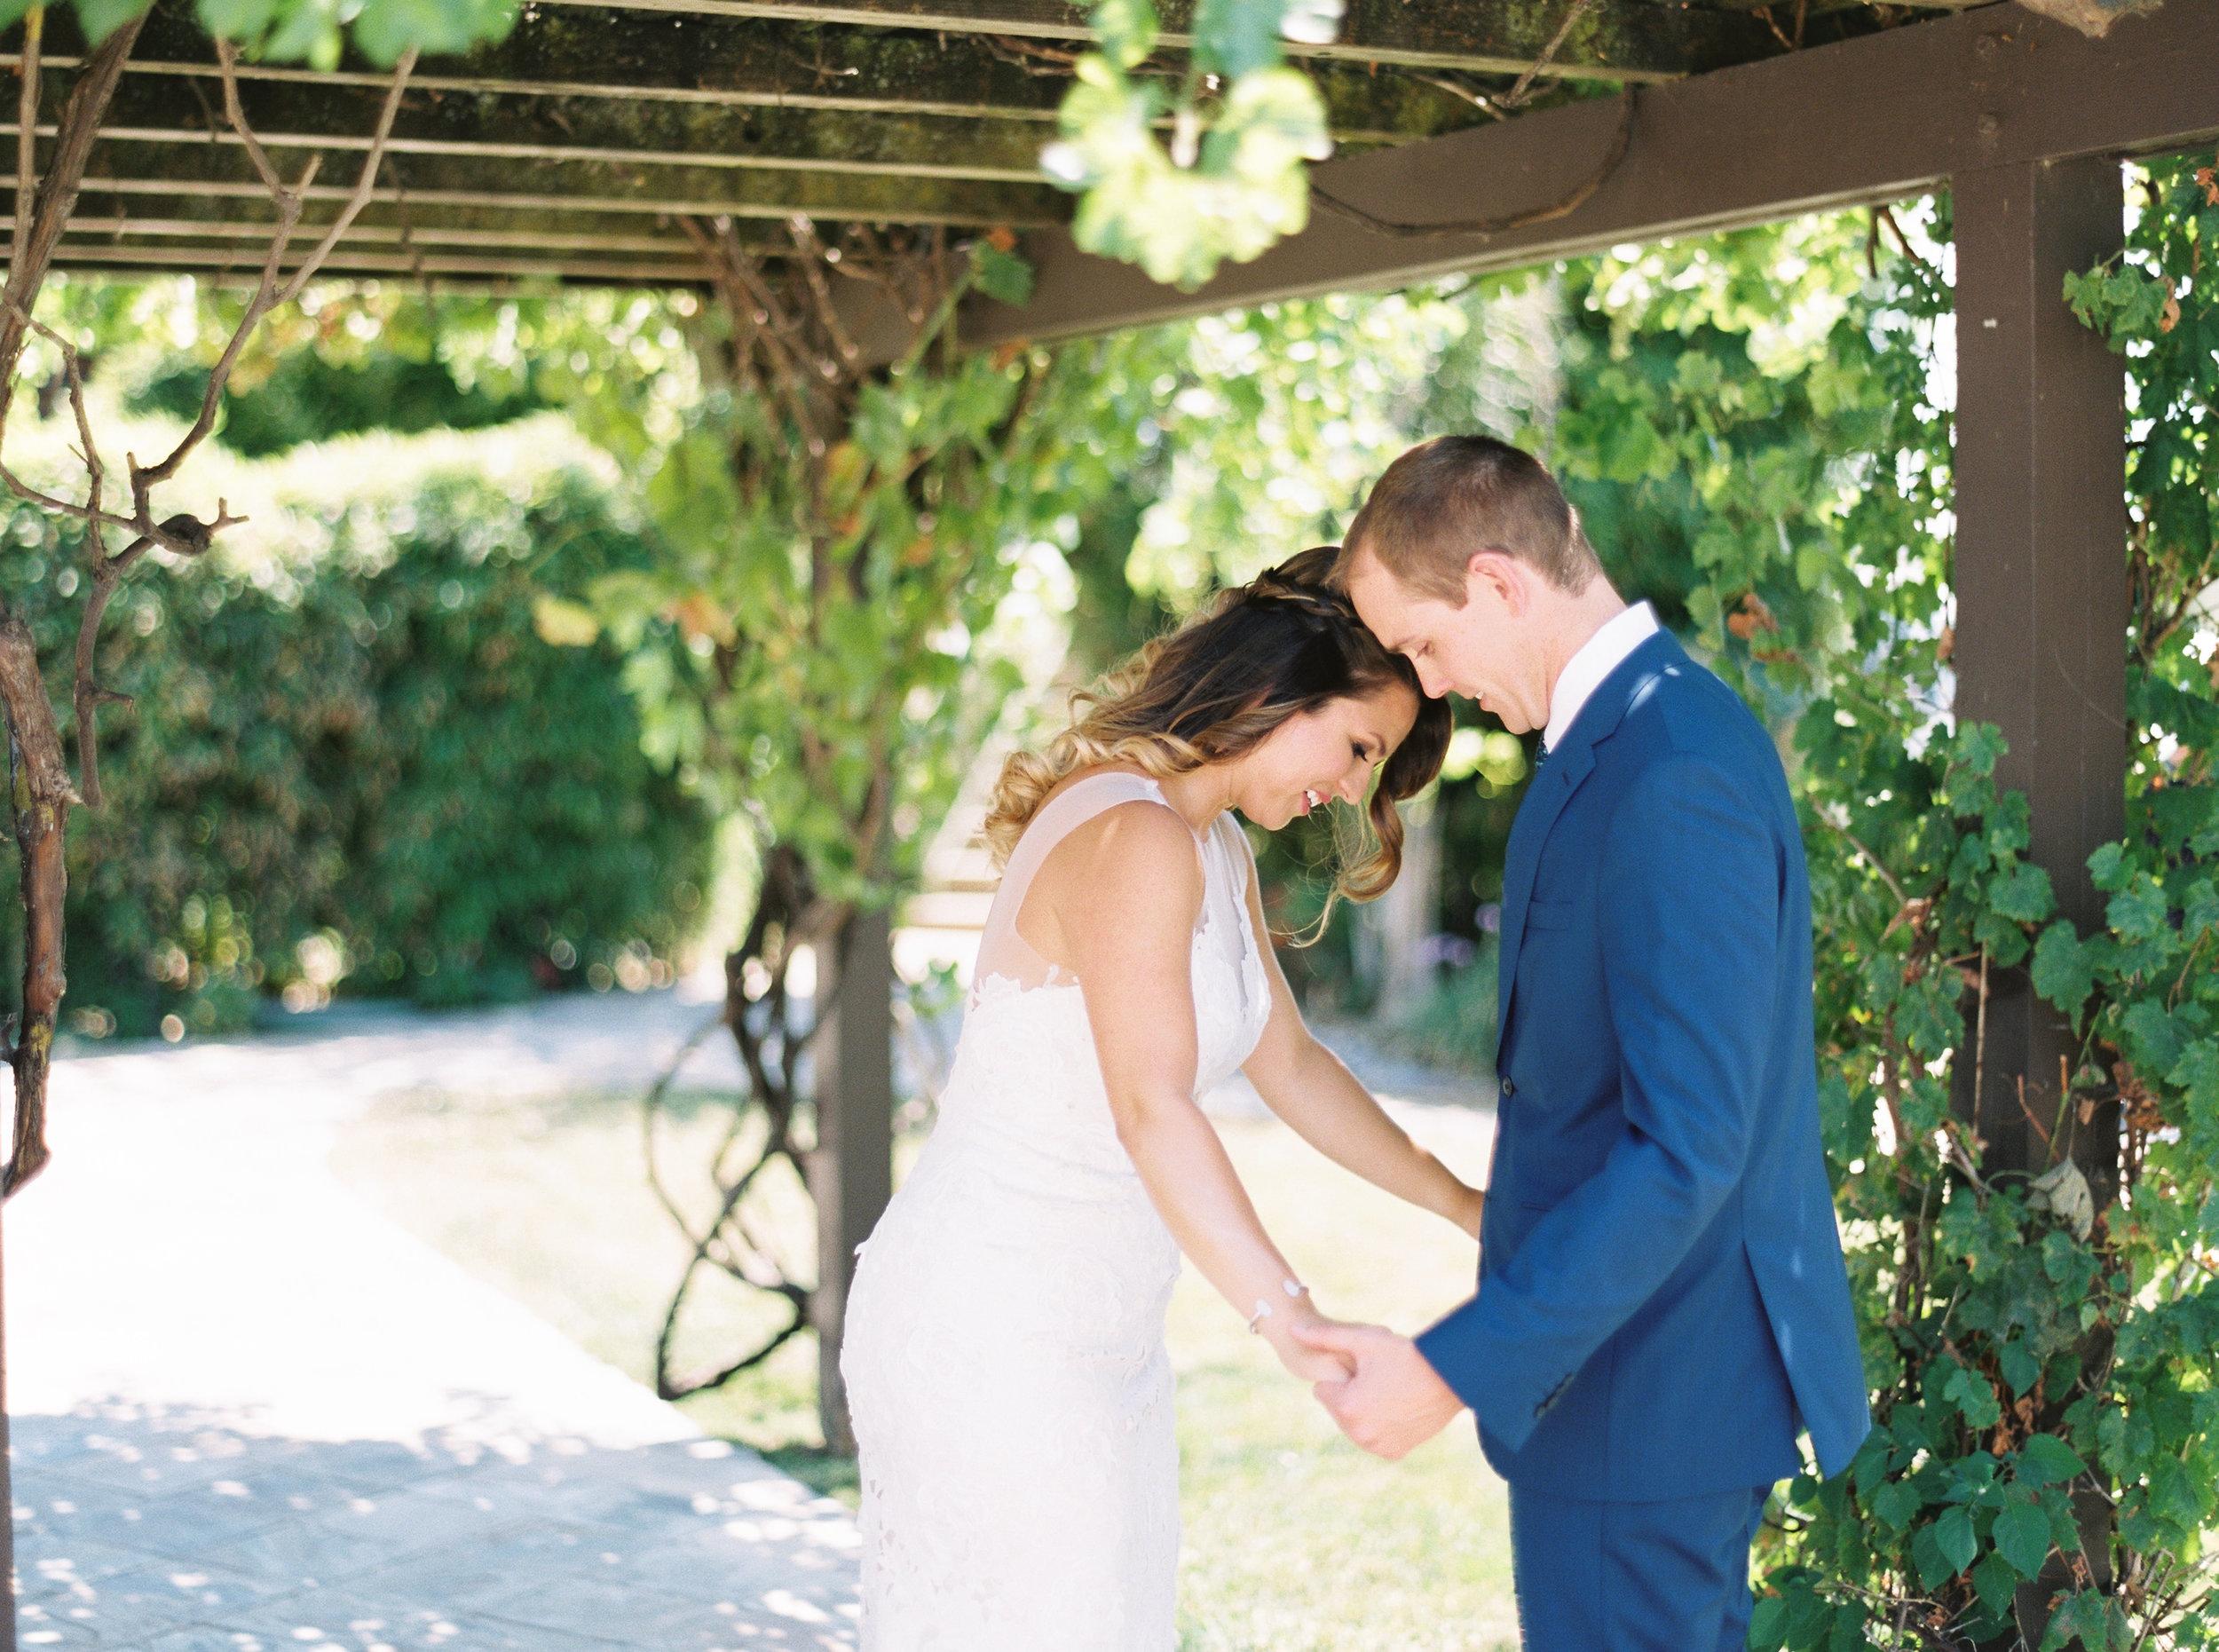 the-purple-orchid-resort-wedding-in-livermore-california-89.jpg